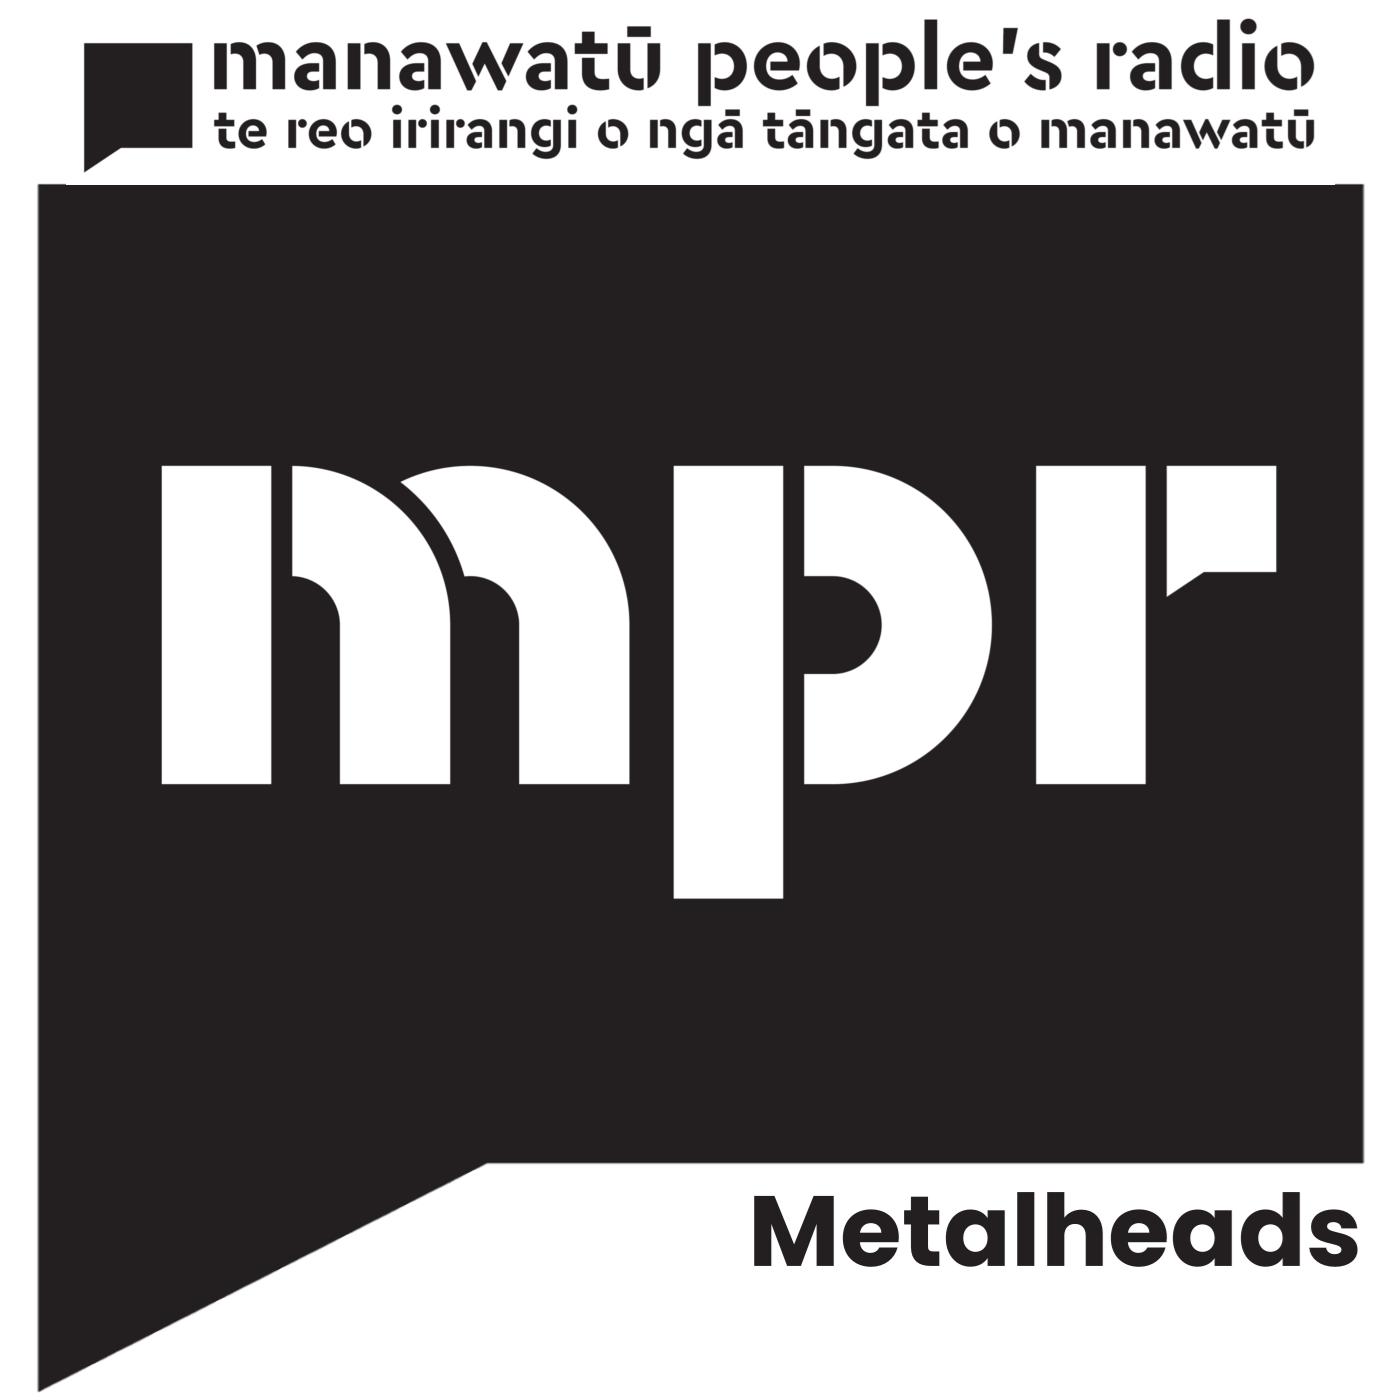 Metalheads 21-09-2018